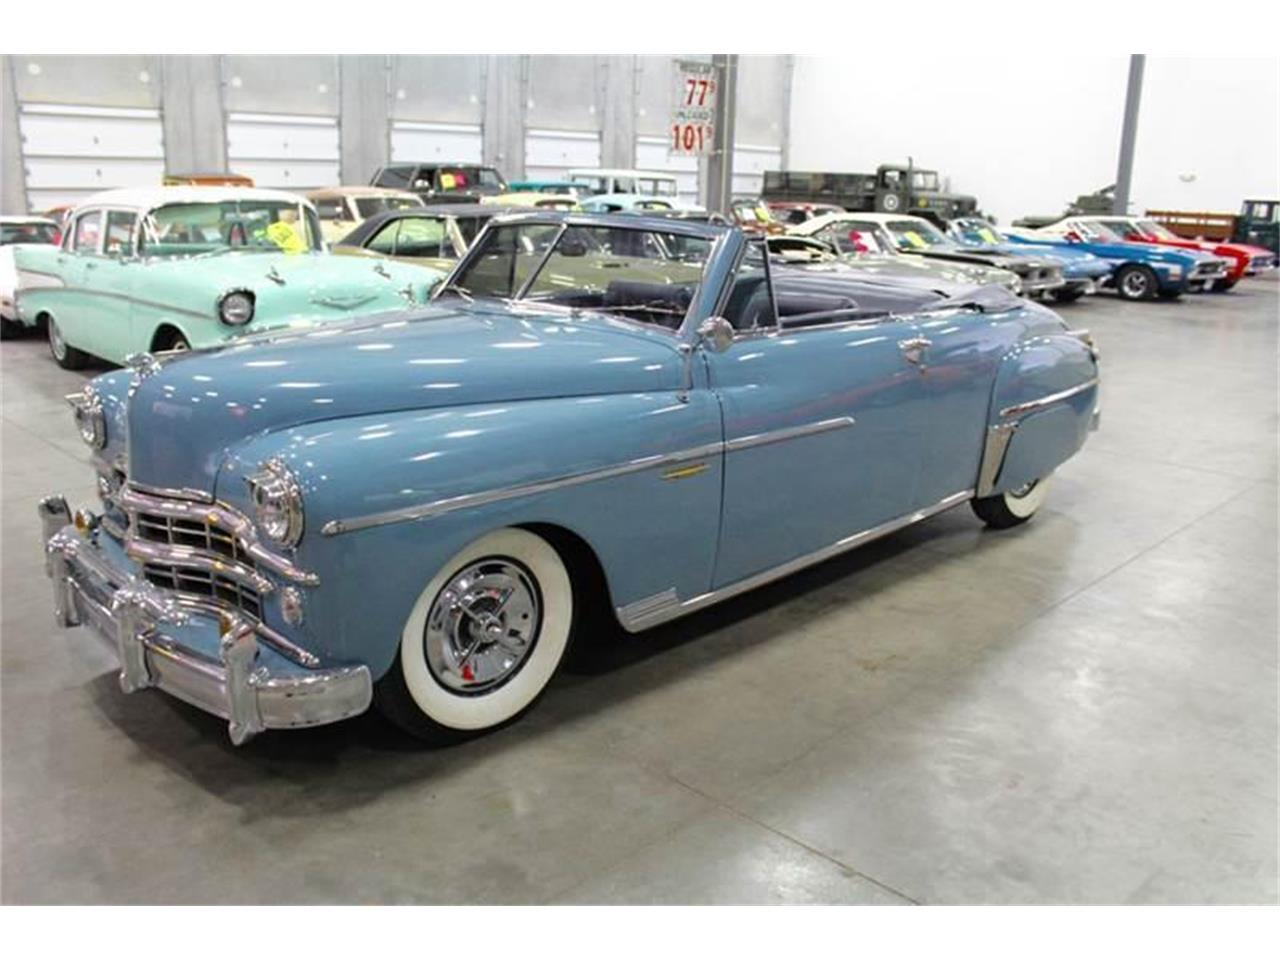 1949 Dodge Coronet For Sale Cc 989596 2 Door Large Picture Of 49 L7ks